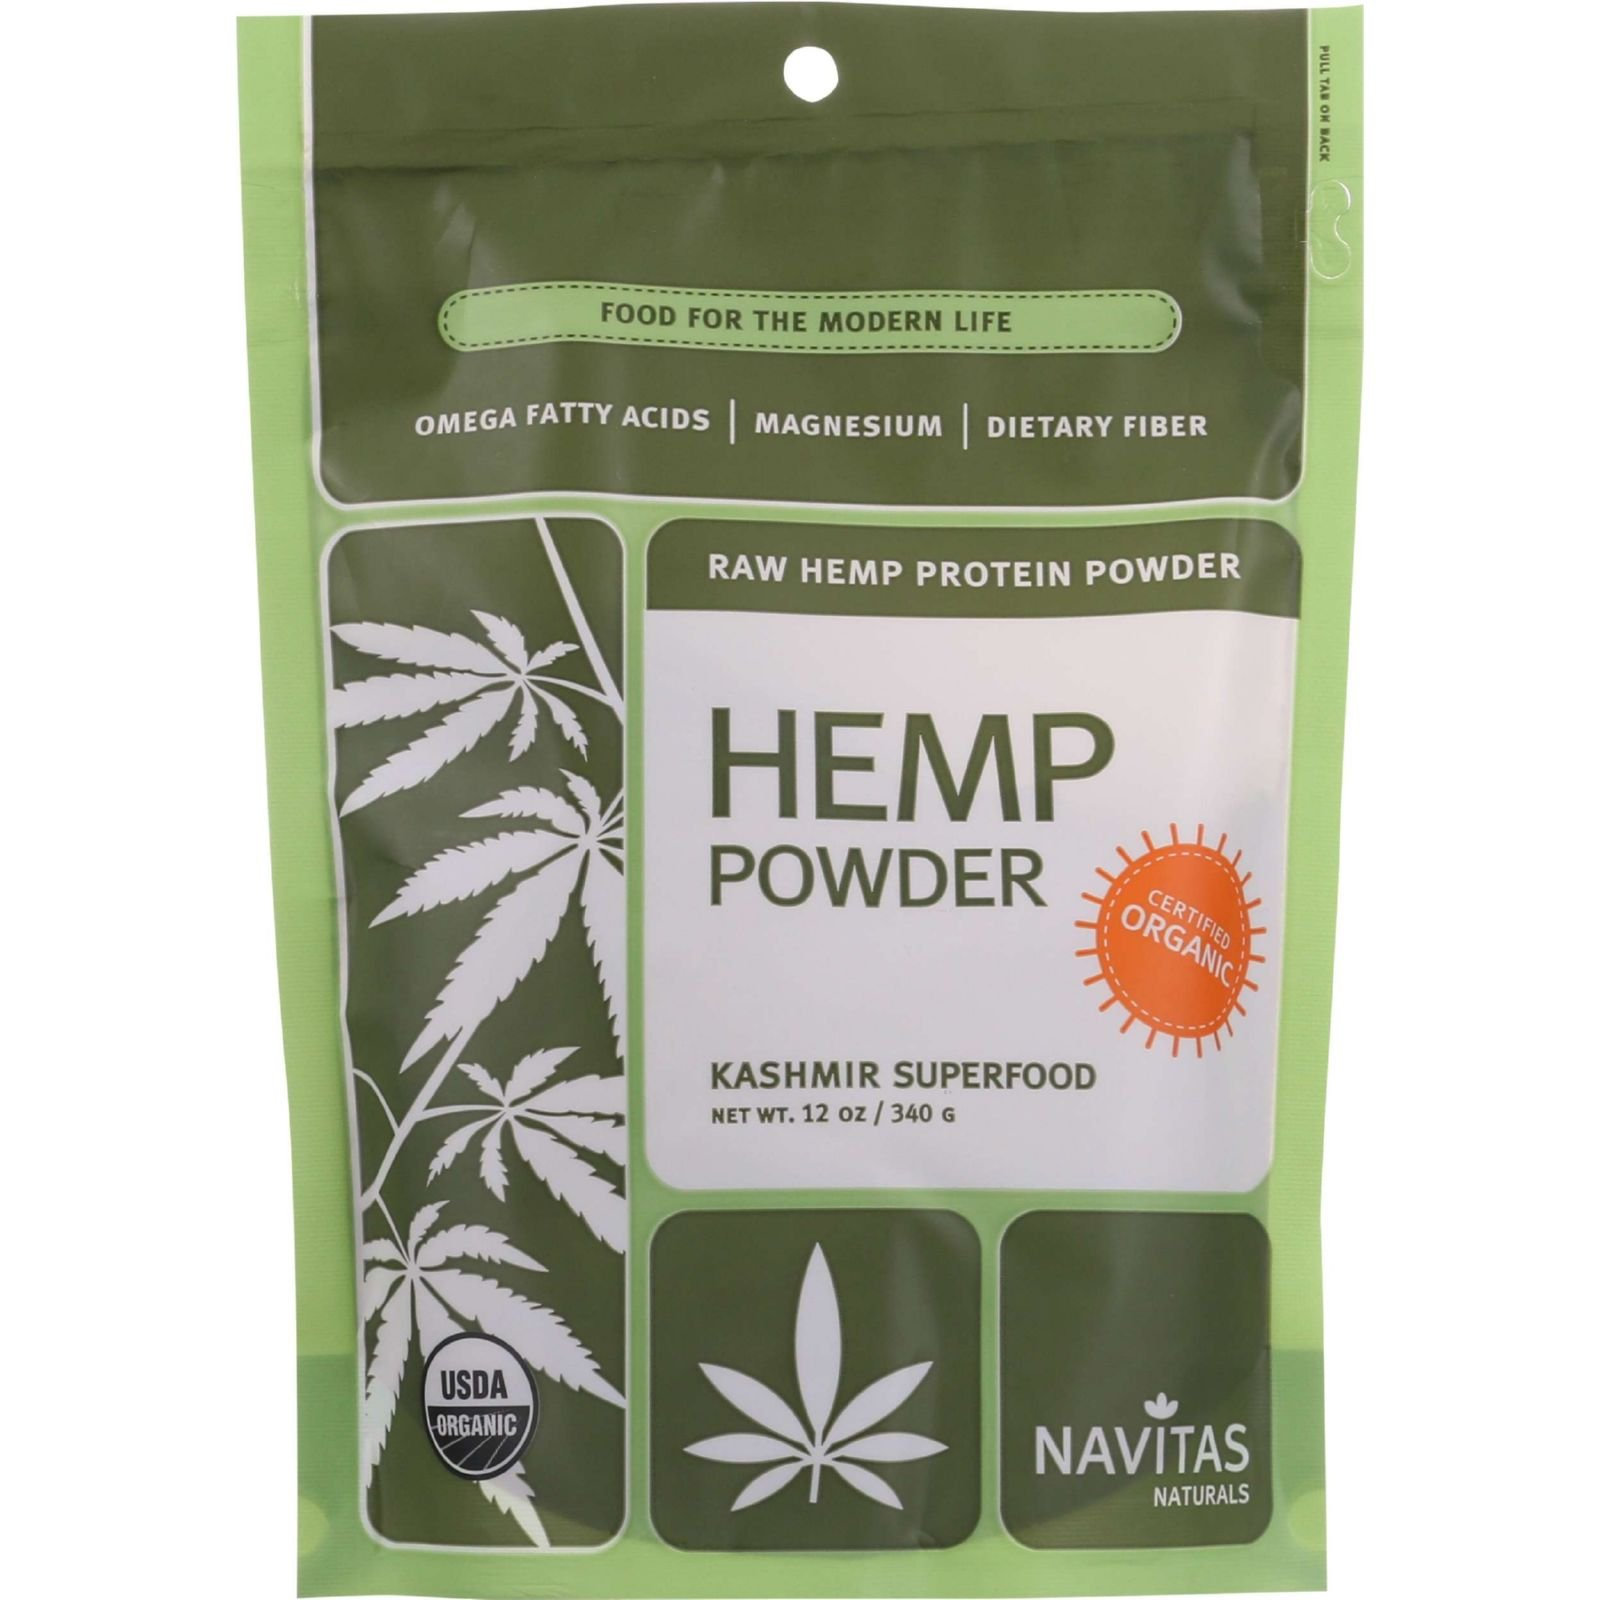 Navitas Naturals Organic Raw Hemp Powder, 12 Ounce - 6 per case.